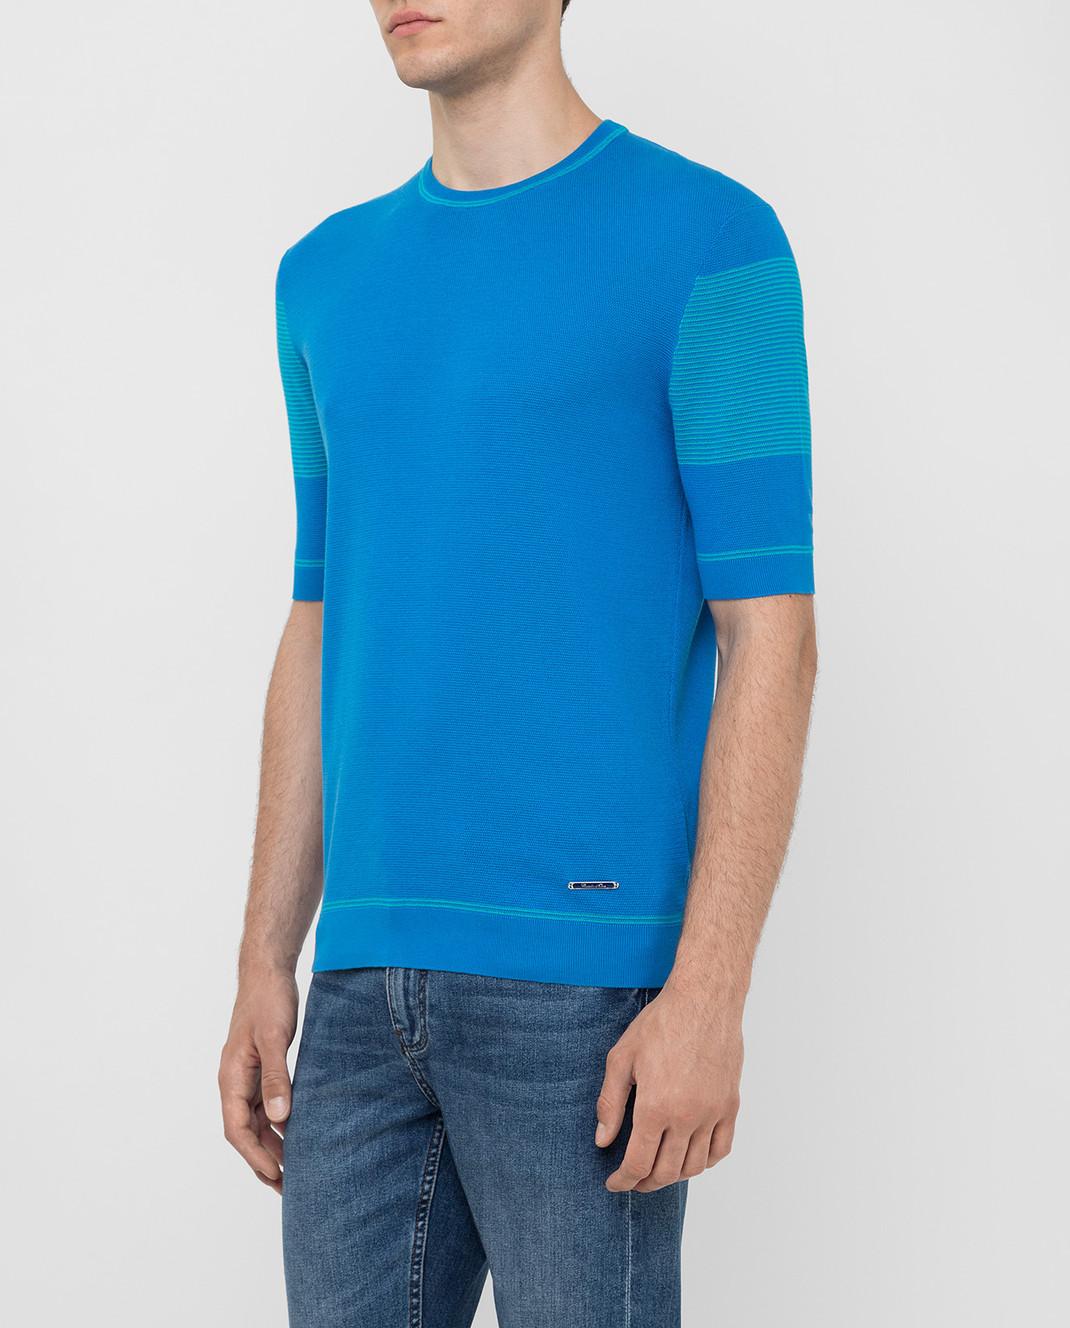 Castello d'Oro Синяя футболка изображение 3